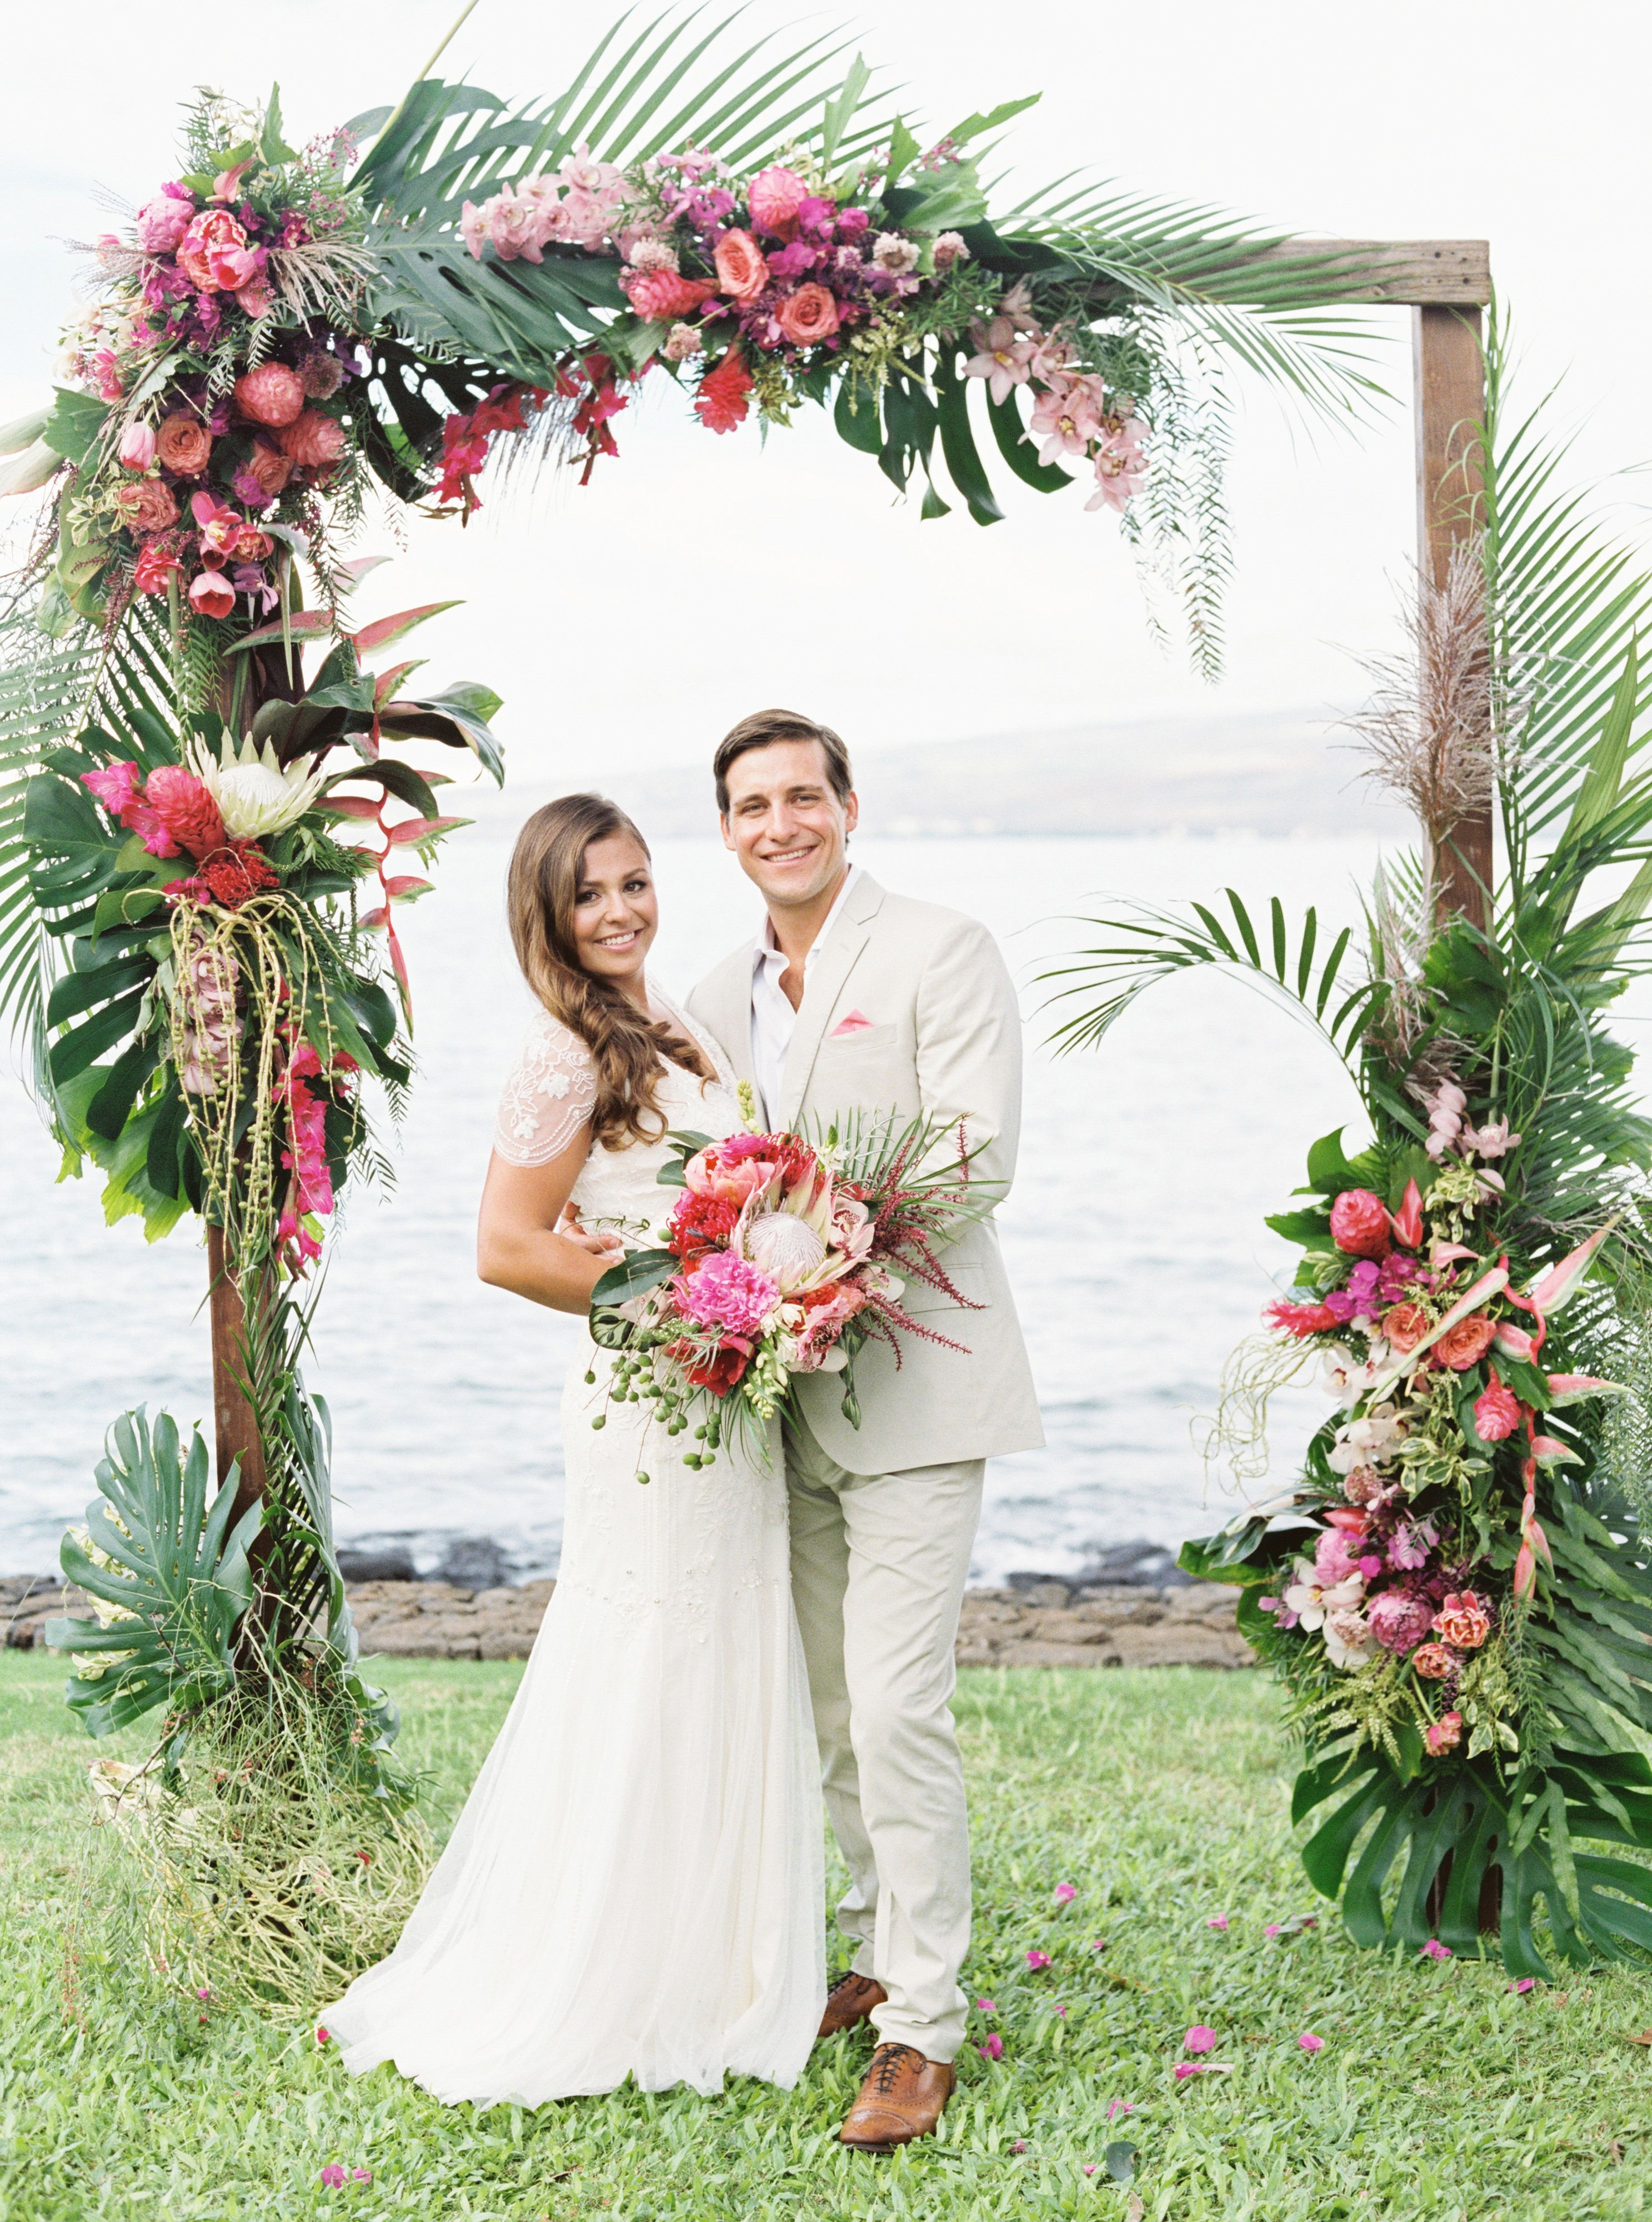 Tropical Wedding Ideas That Will Transform Your Big Day